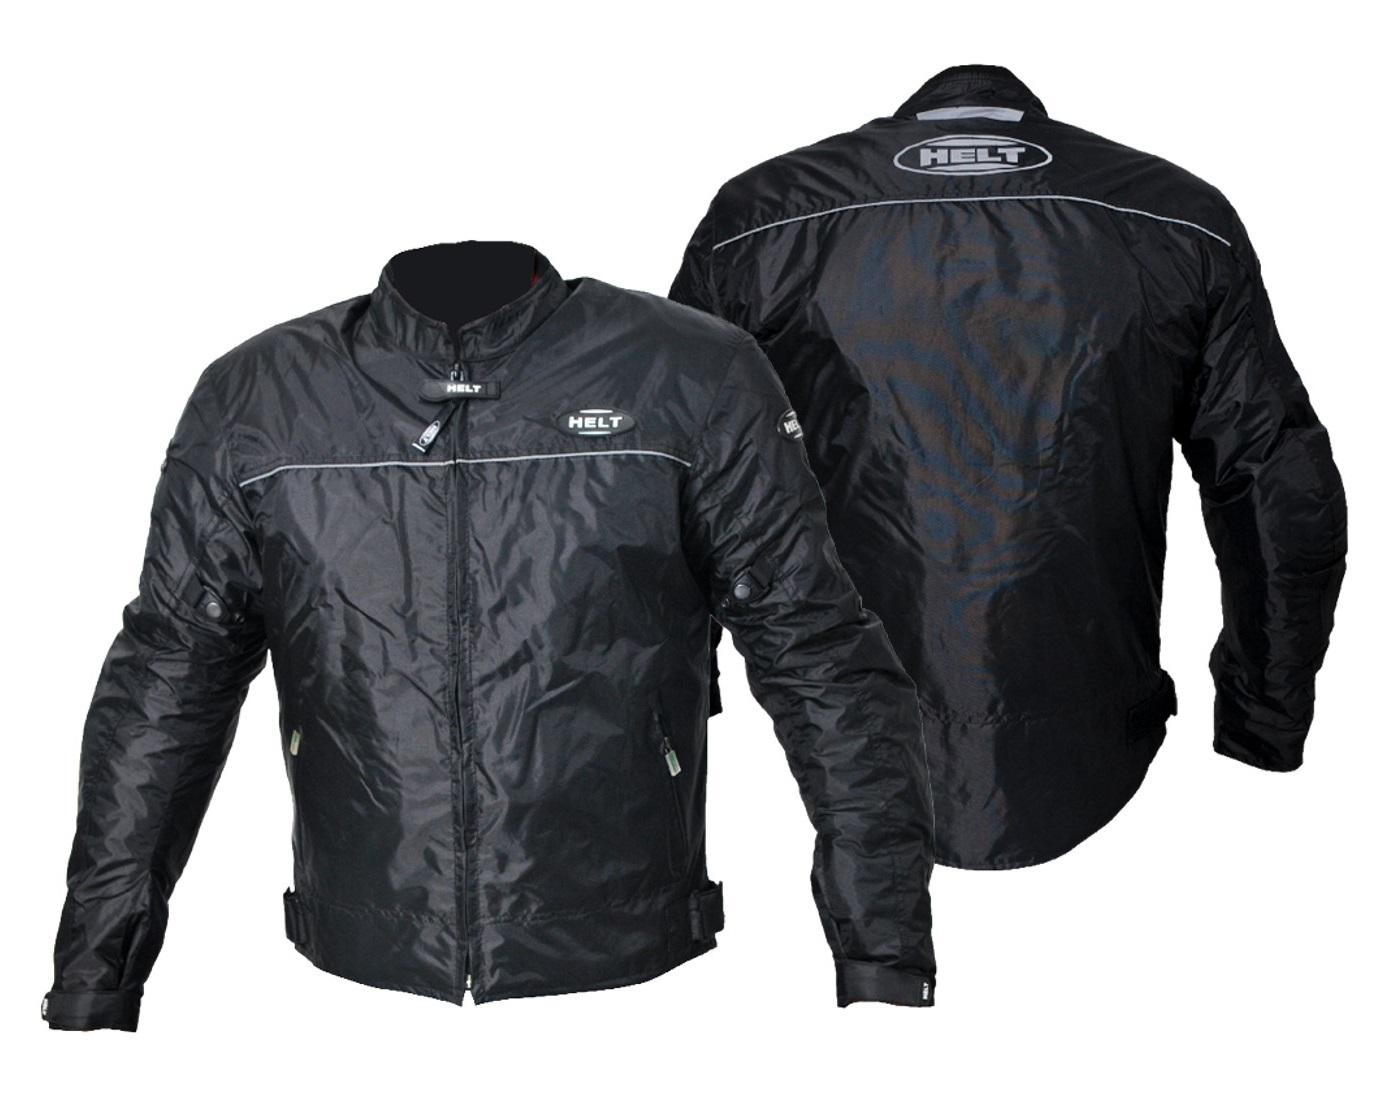 Jaqueta Masculina Helt Daytona Nylon Preta Resistente À Água C/ Proteções